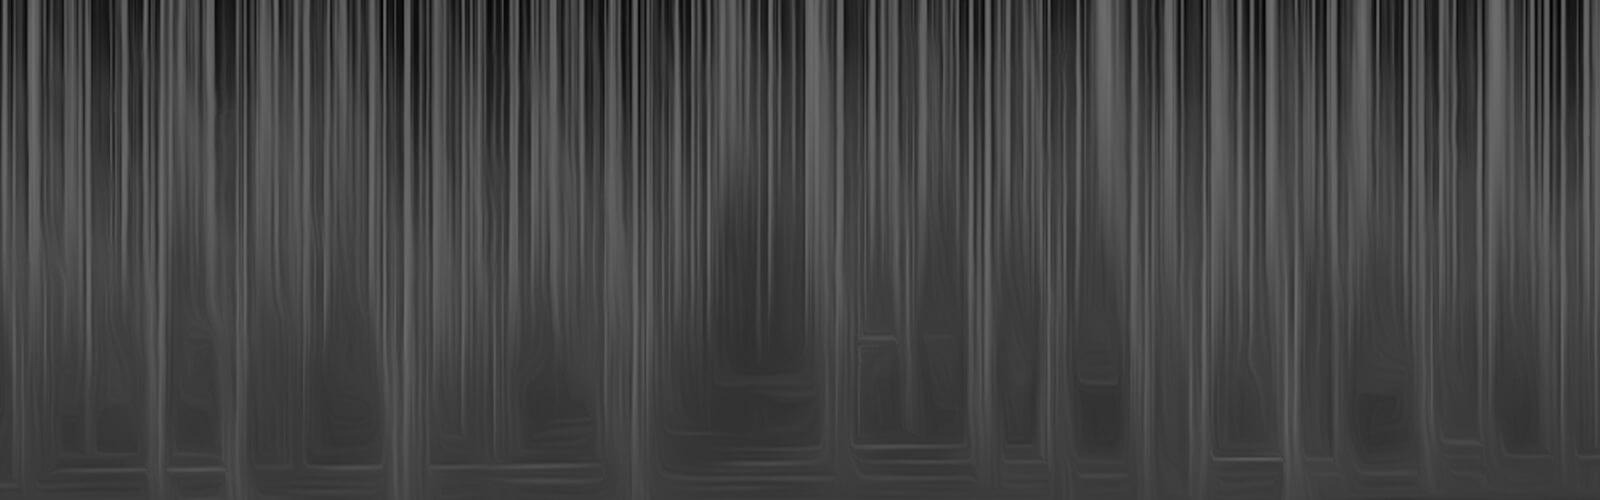 Datacentre Background